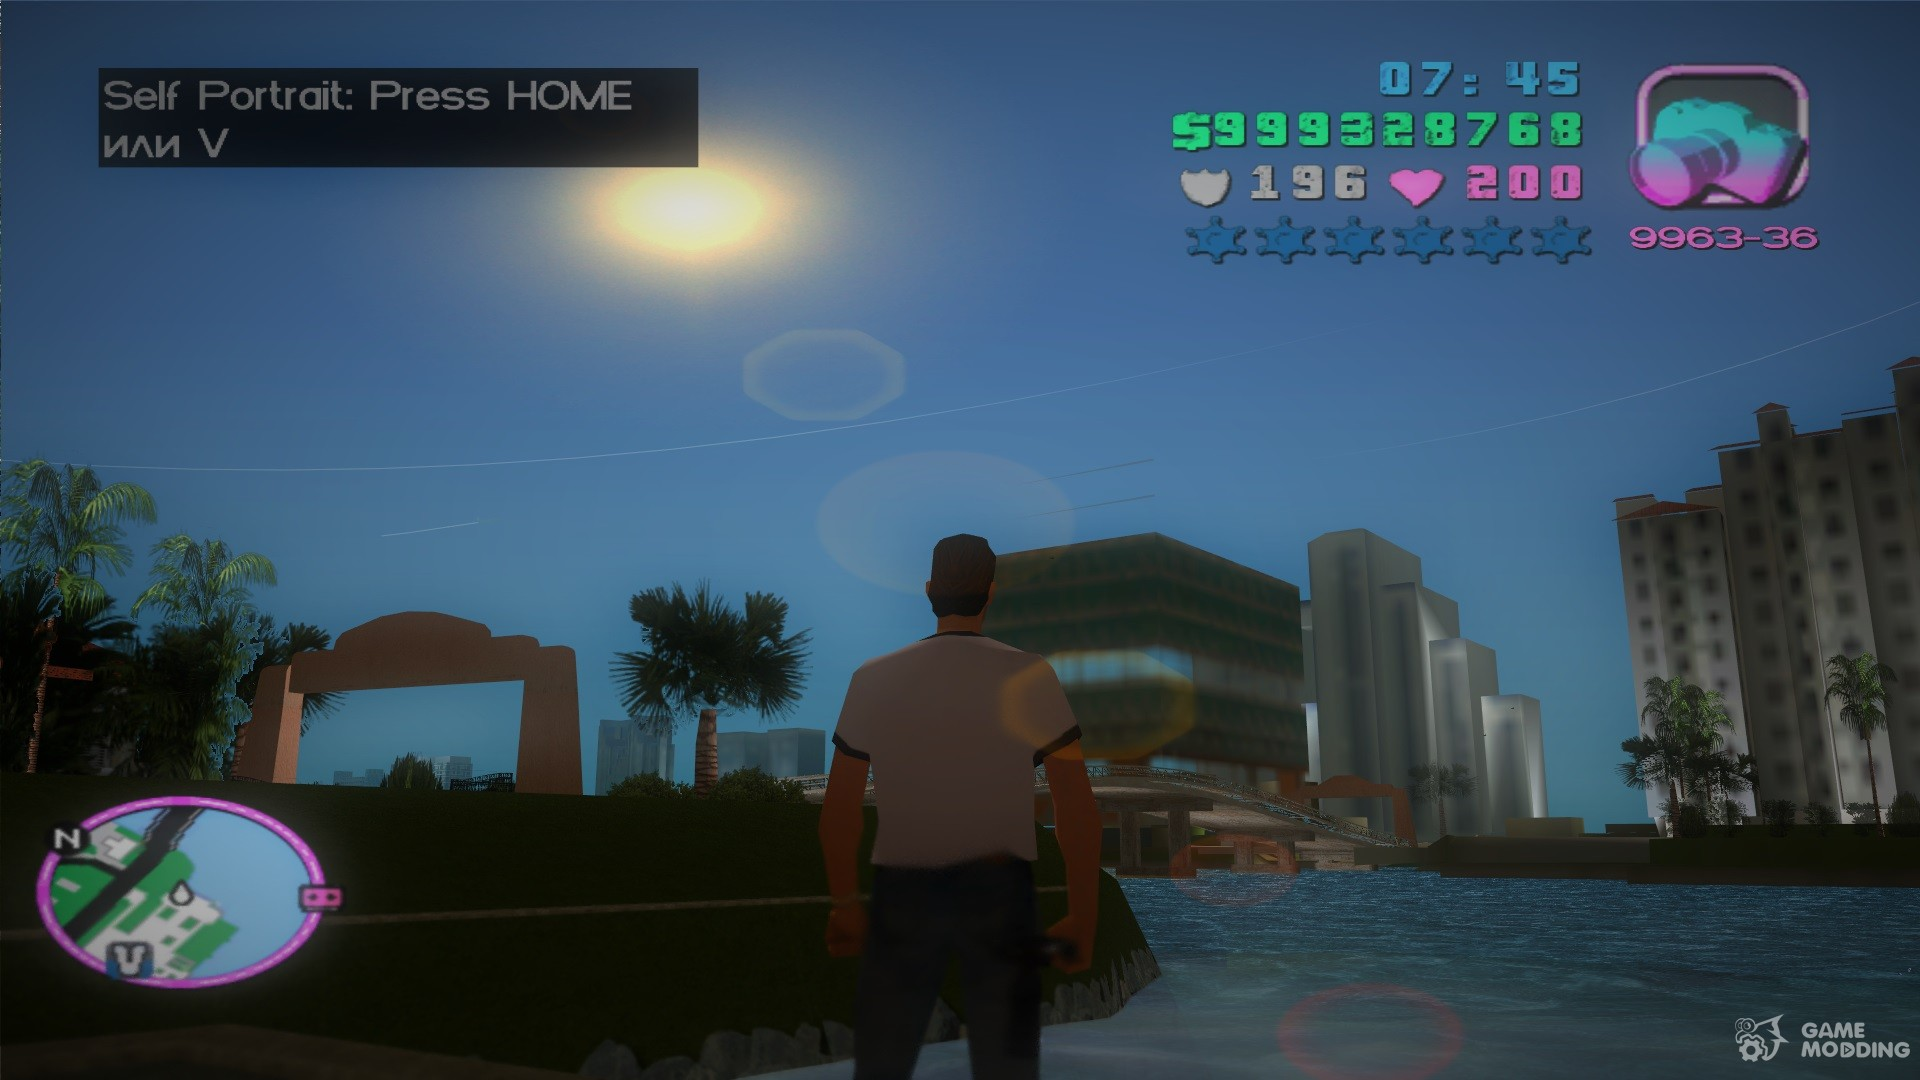 Gta Vice City Graphics Mod Download Pc